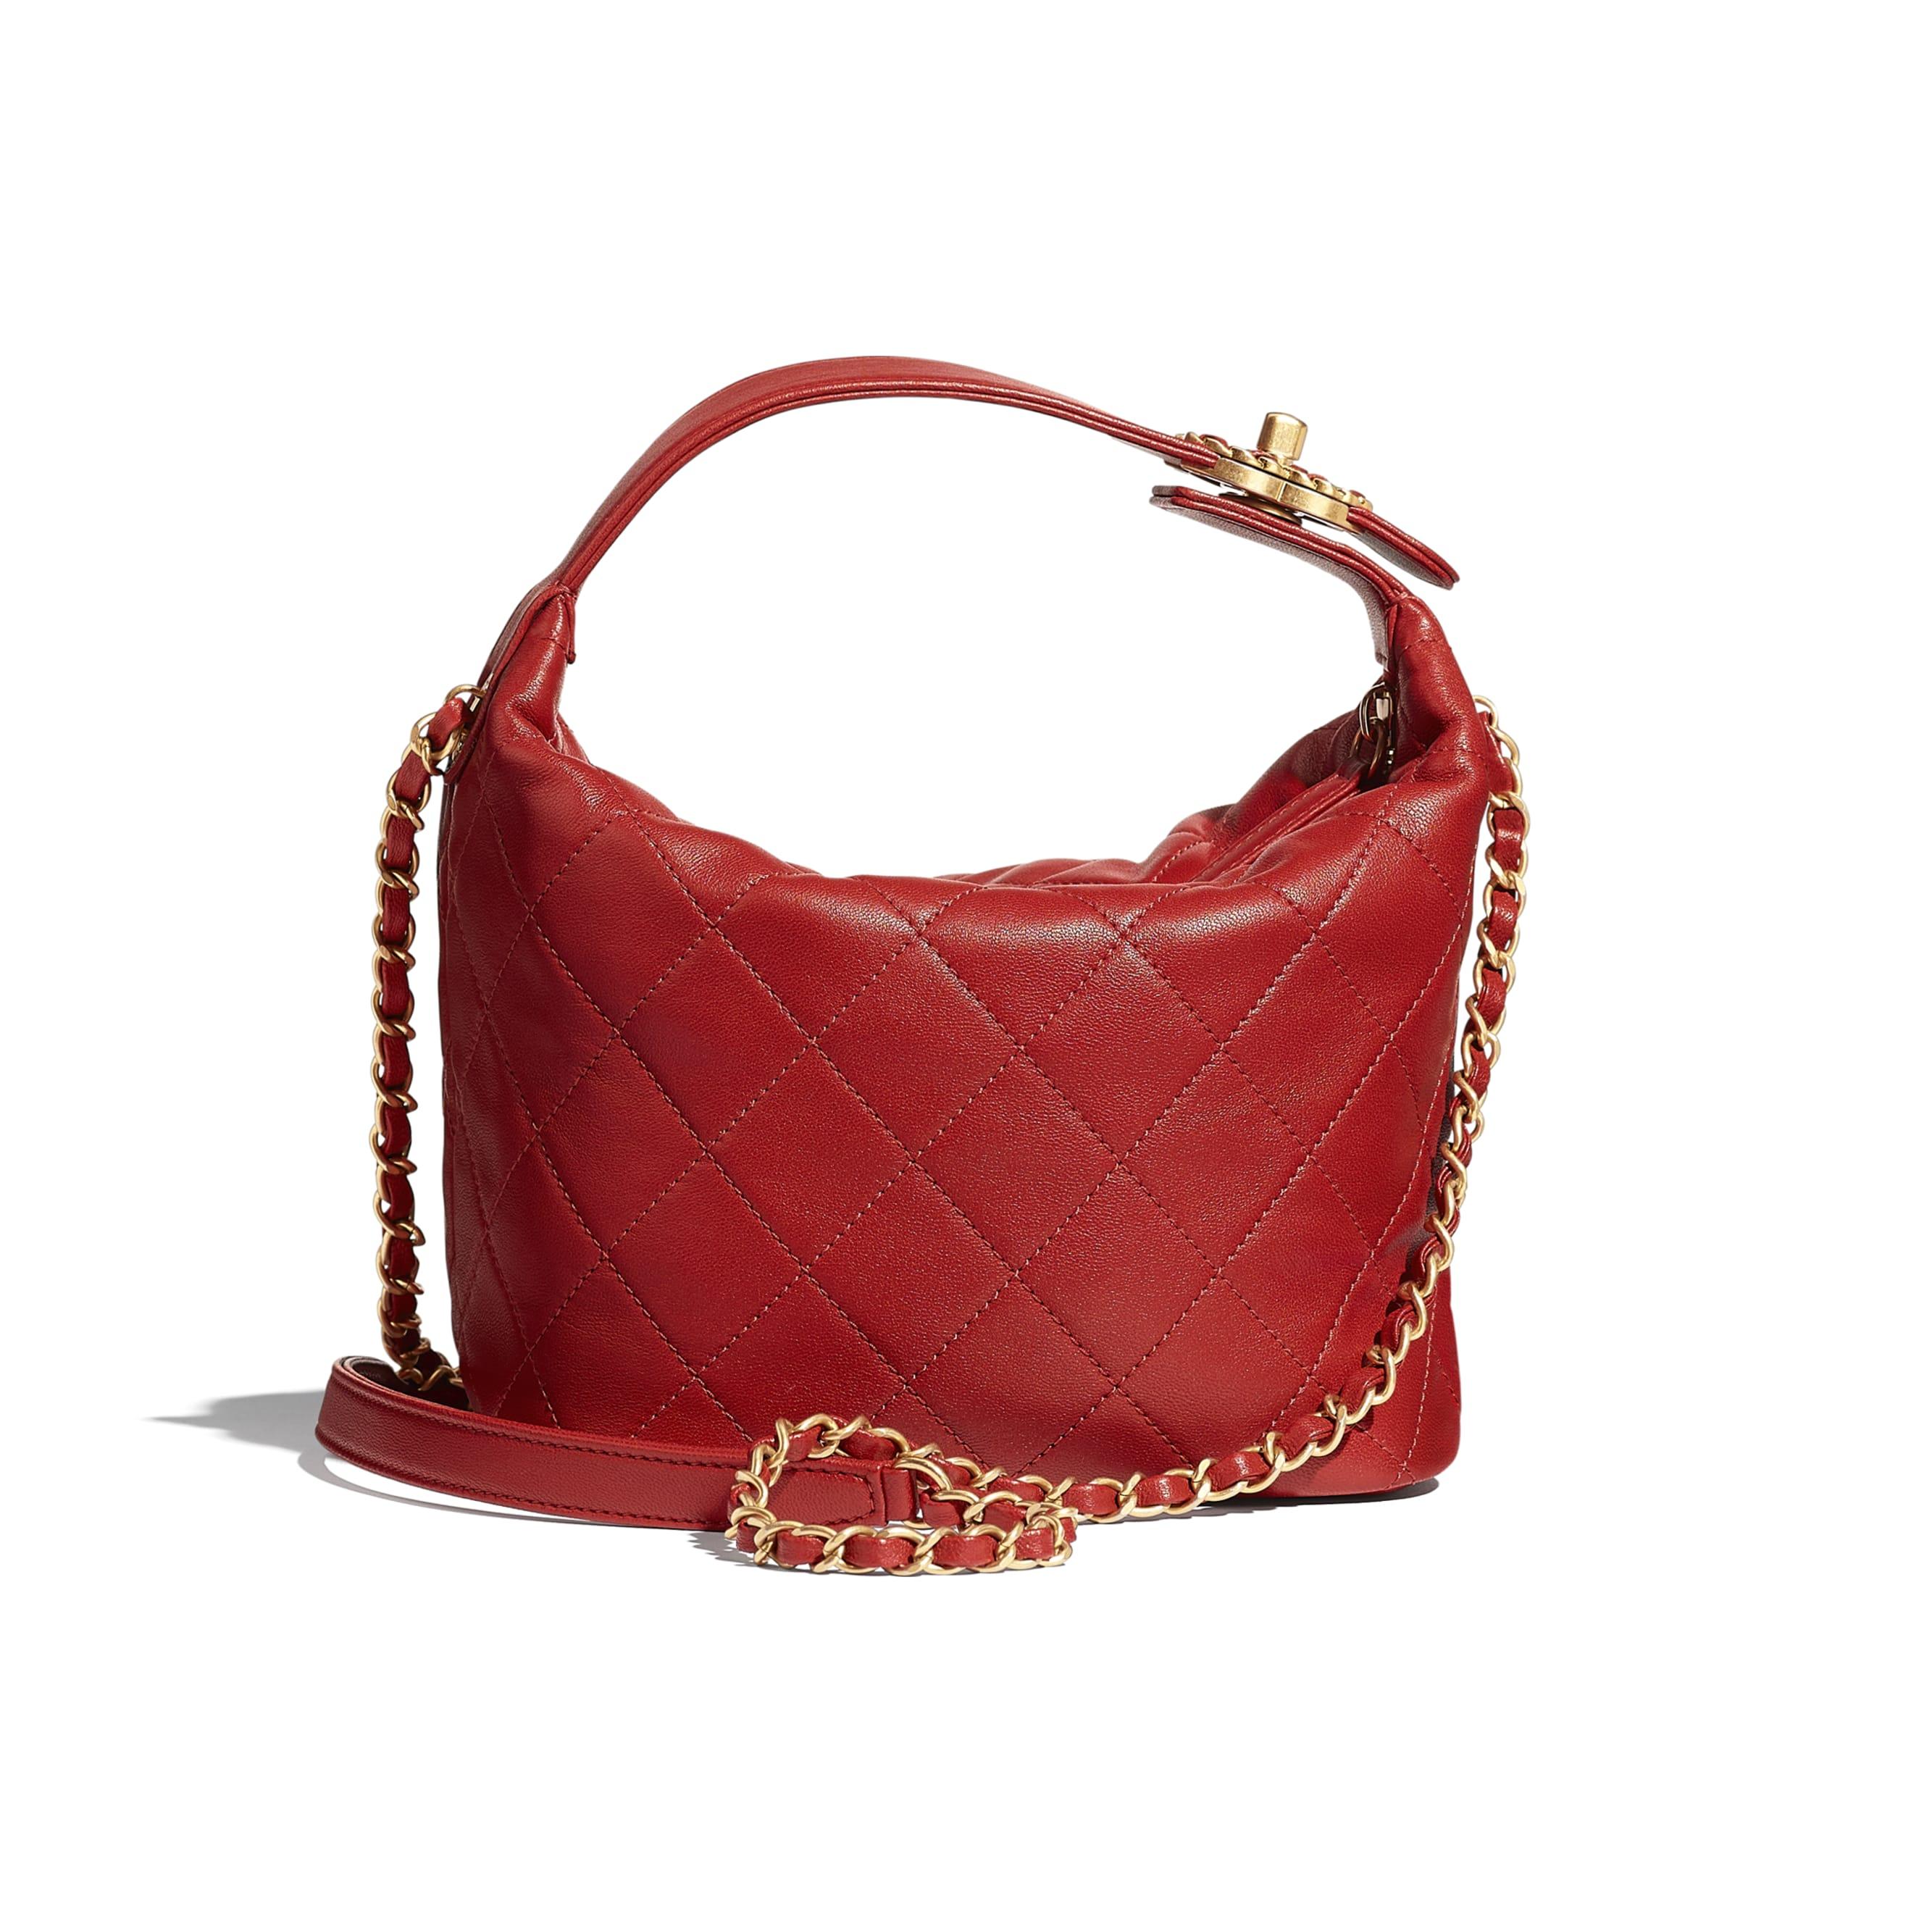 Hobo Handbag - Red - Lambskin & Gold Metal - CHANEL - Alternative view - see standard sized version